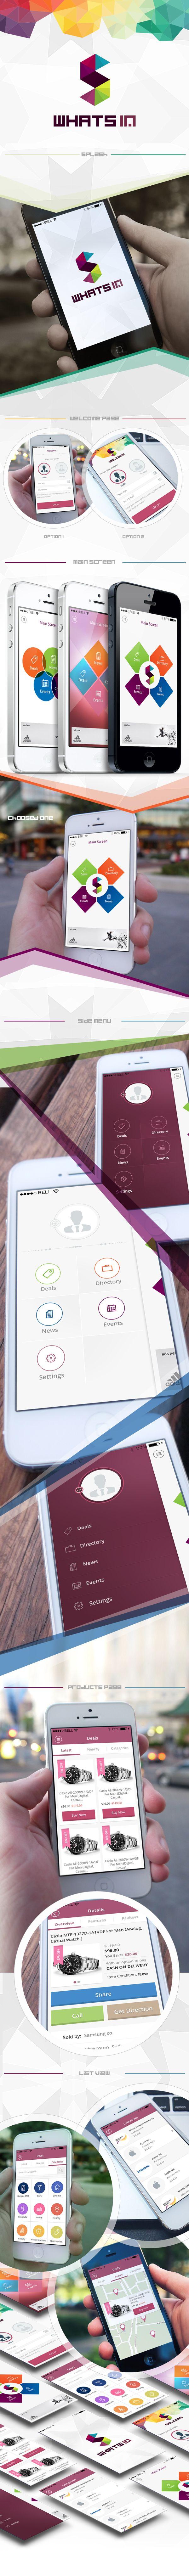 whats in mobile app by Mohammed Agwa, via Behance